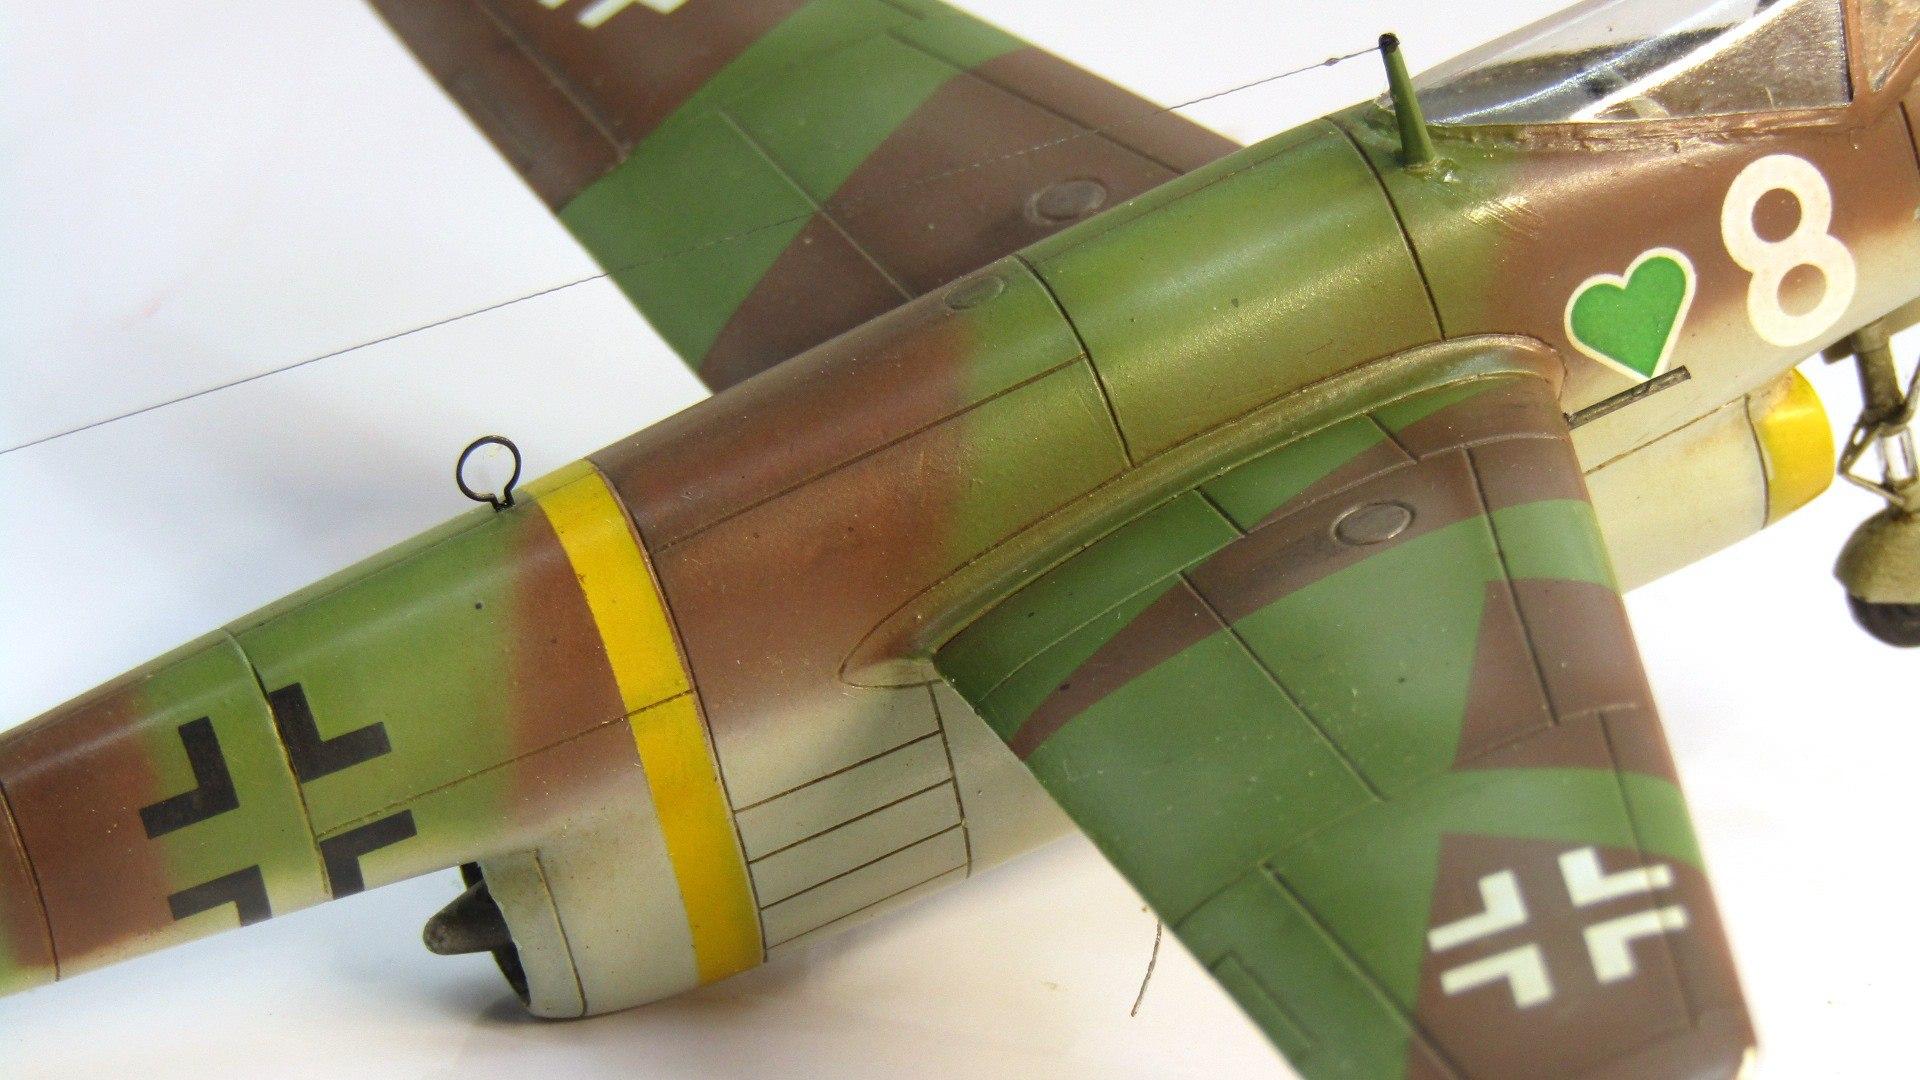 Fw-P-II 1/72 (Special Hobby) YzU9f6t6ijg